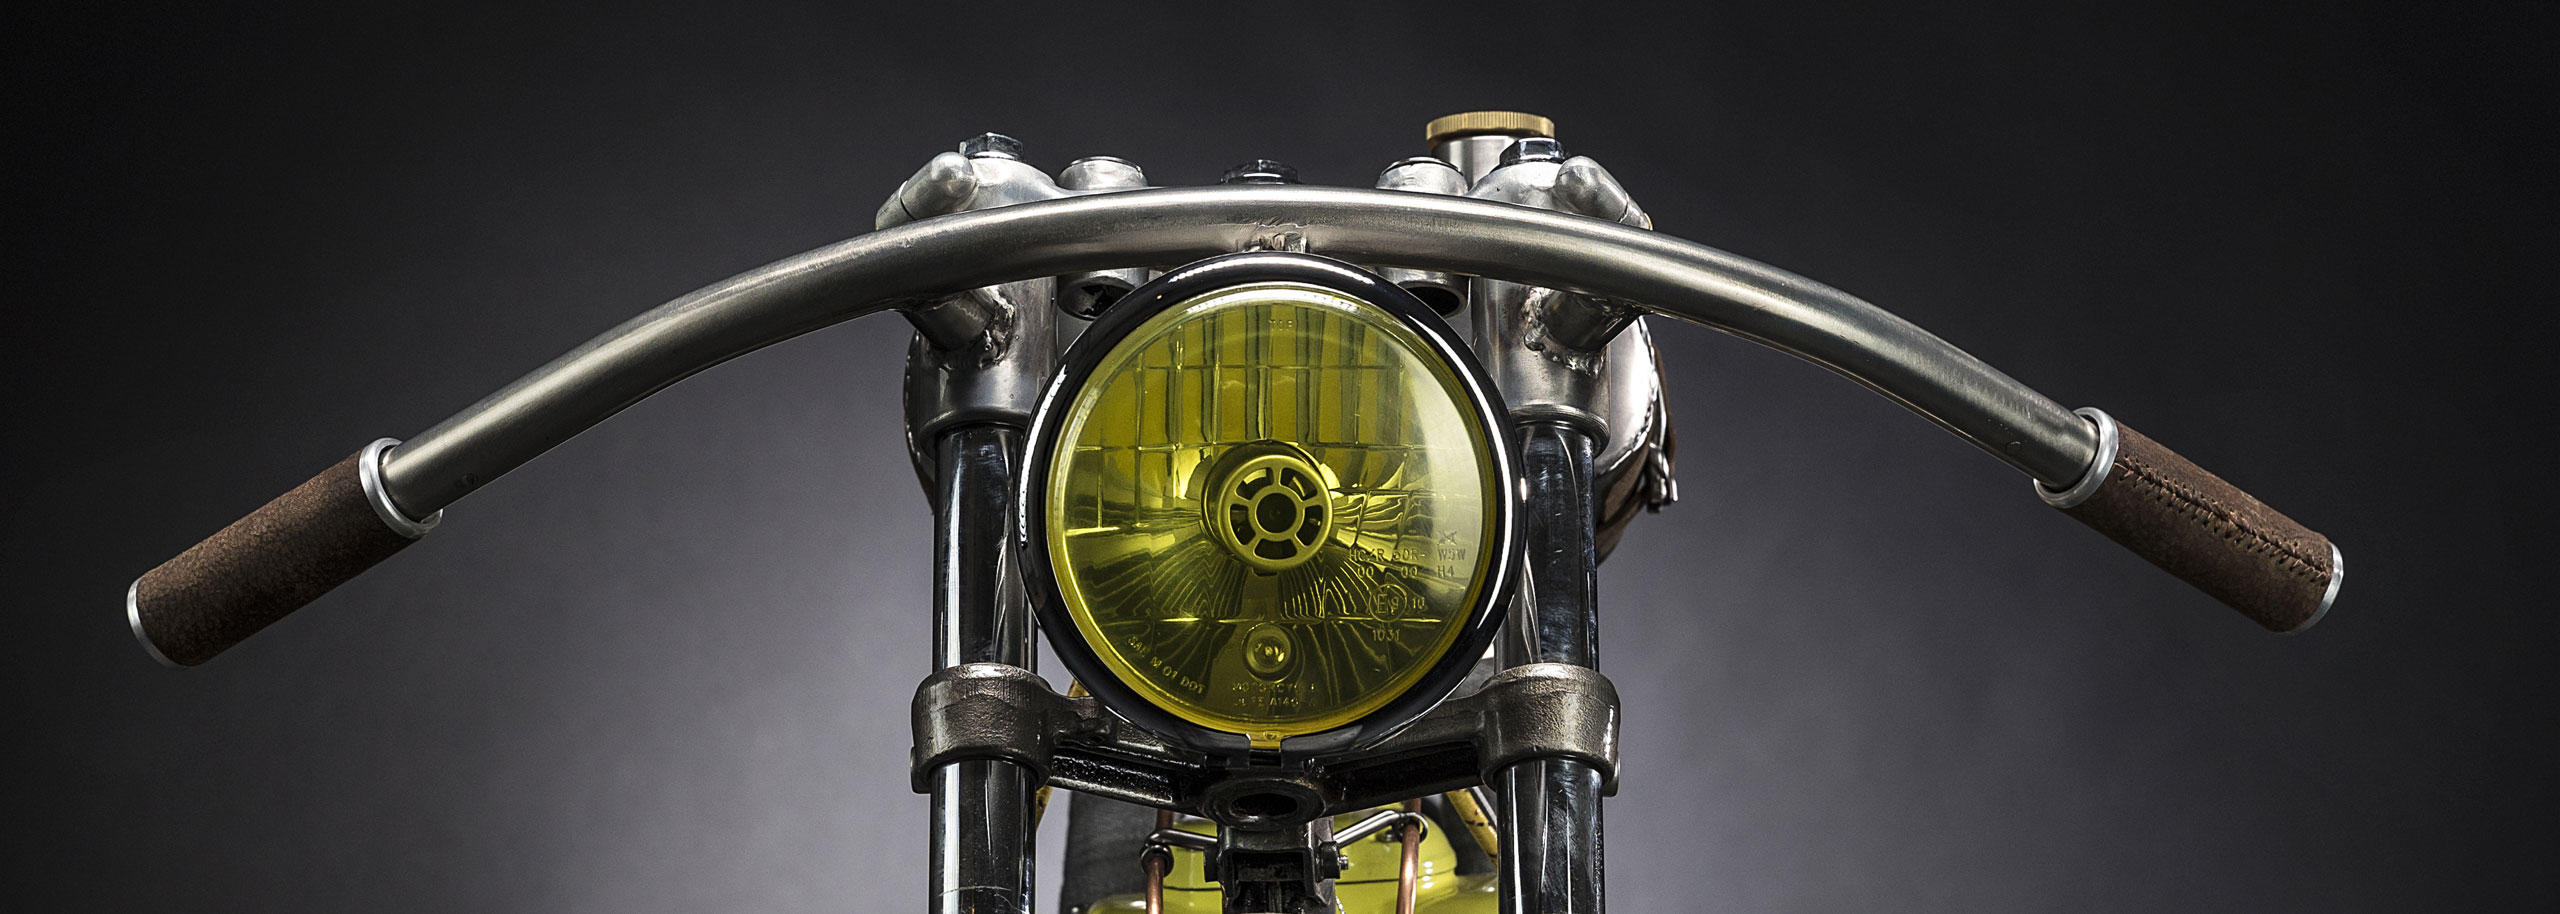 Titan-One_Alte-Maschinen-Custom-Cafe-Racer-Graz-Reduktion-Design-Zulassung-Typisiert-TÜV_Bike-Styira-Oldtimer-Konzept-Honda-Umbau_staatsmeister-Viertelmeile-Rennen-1